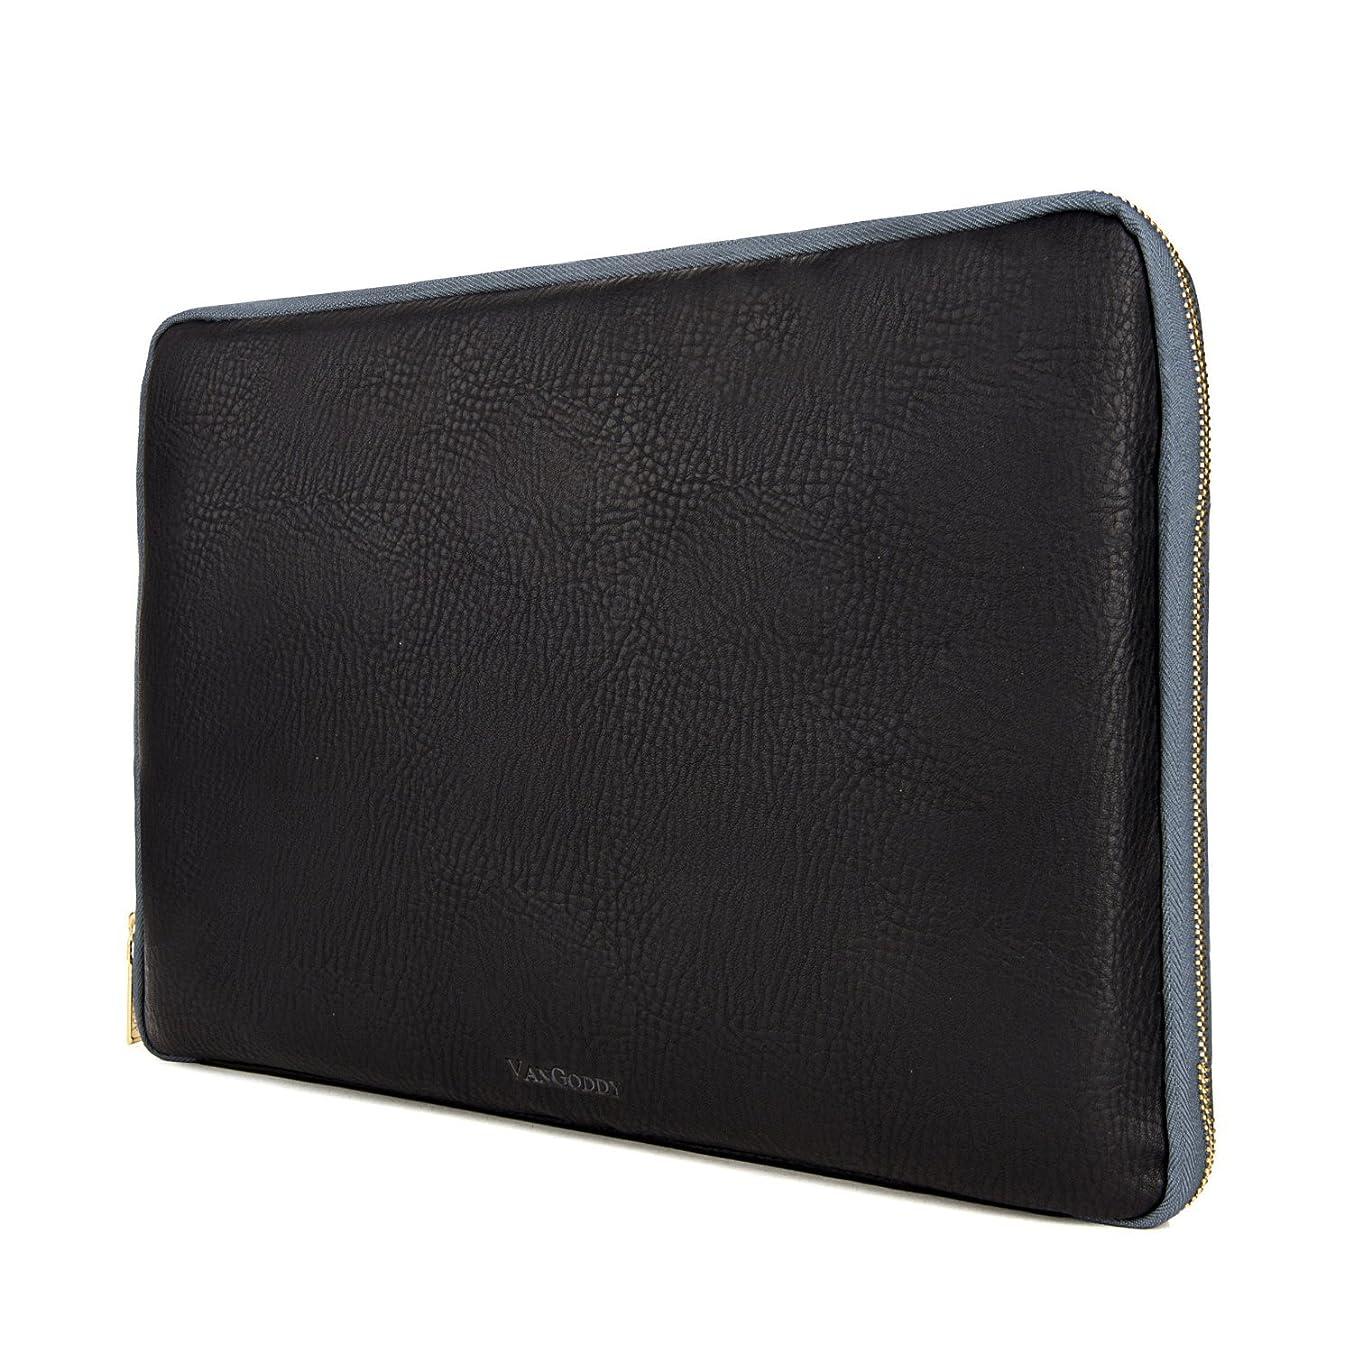 Irista Leatherette Carrying Sleeve for HP Pavilion & Envy 15.6 inch Laptops (Black - Dark Slate)